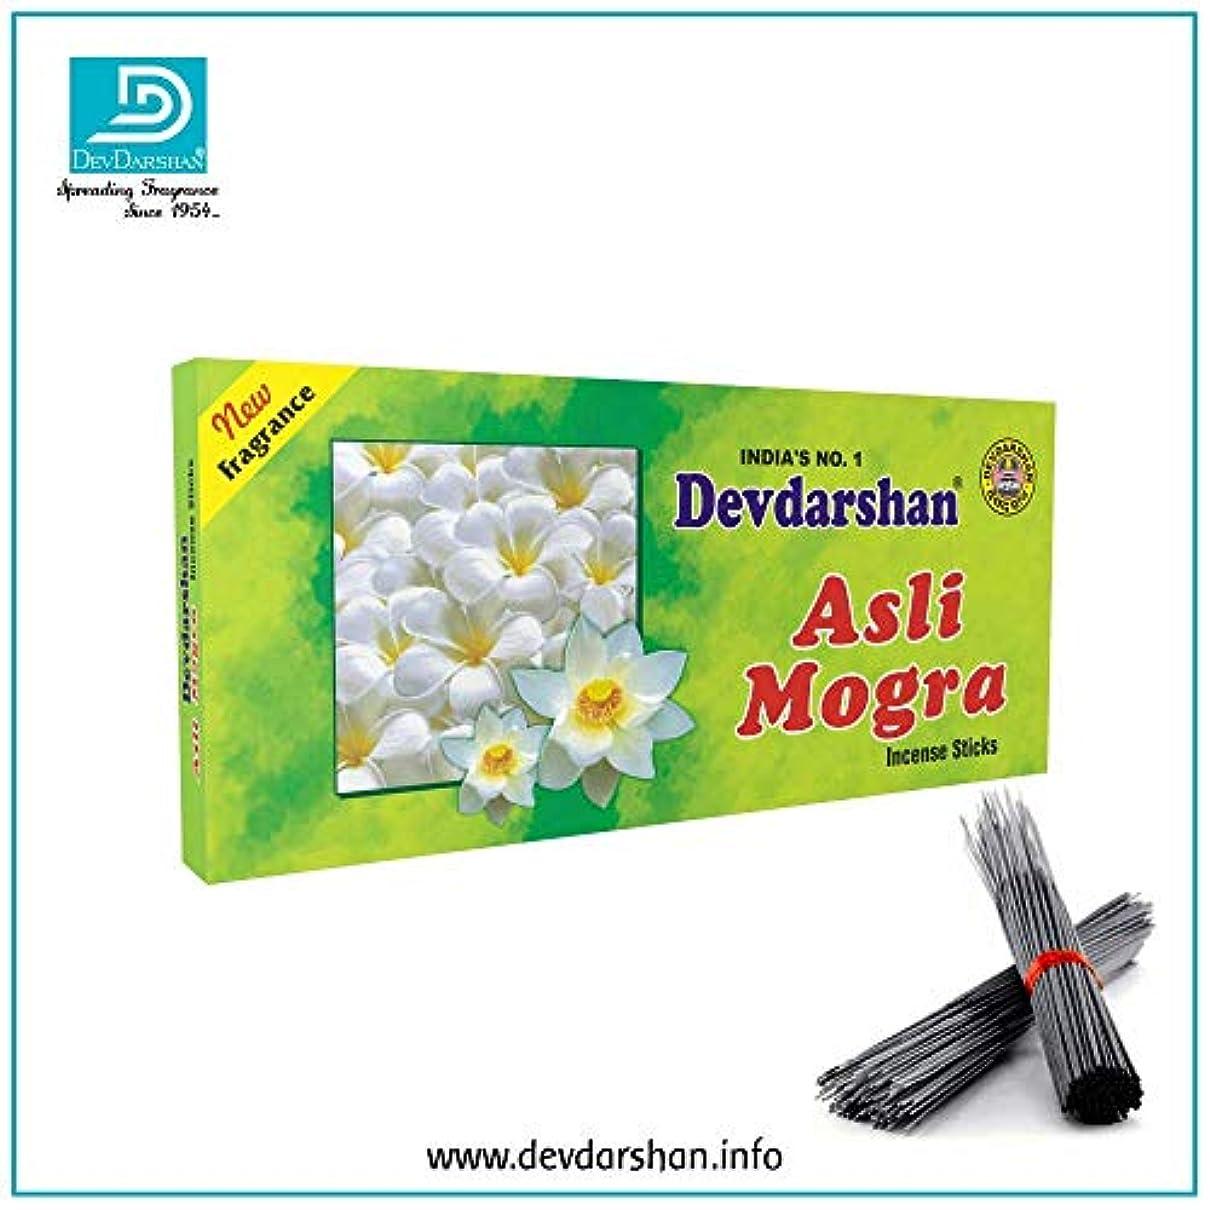 用心気球悲鳴Devdarshan Asli Mogra Agarbatti (Pack of 12) 40g Each Unit